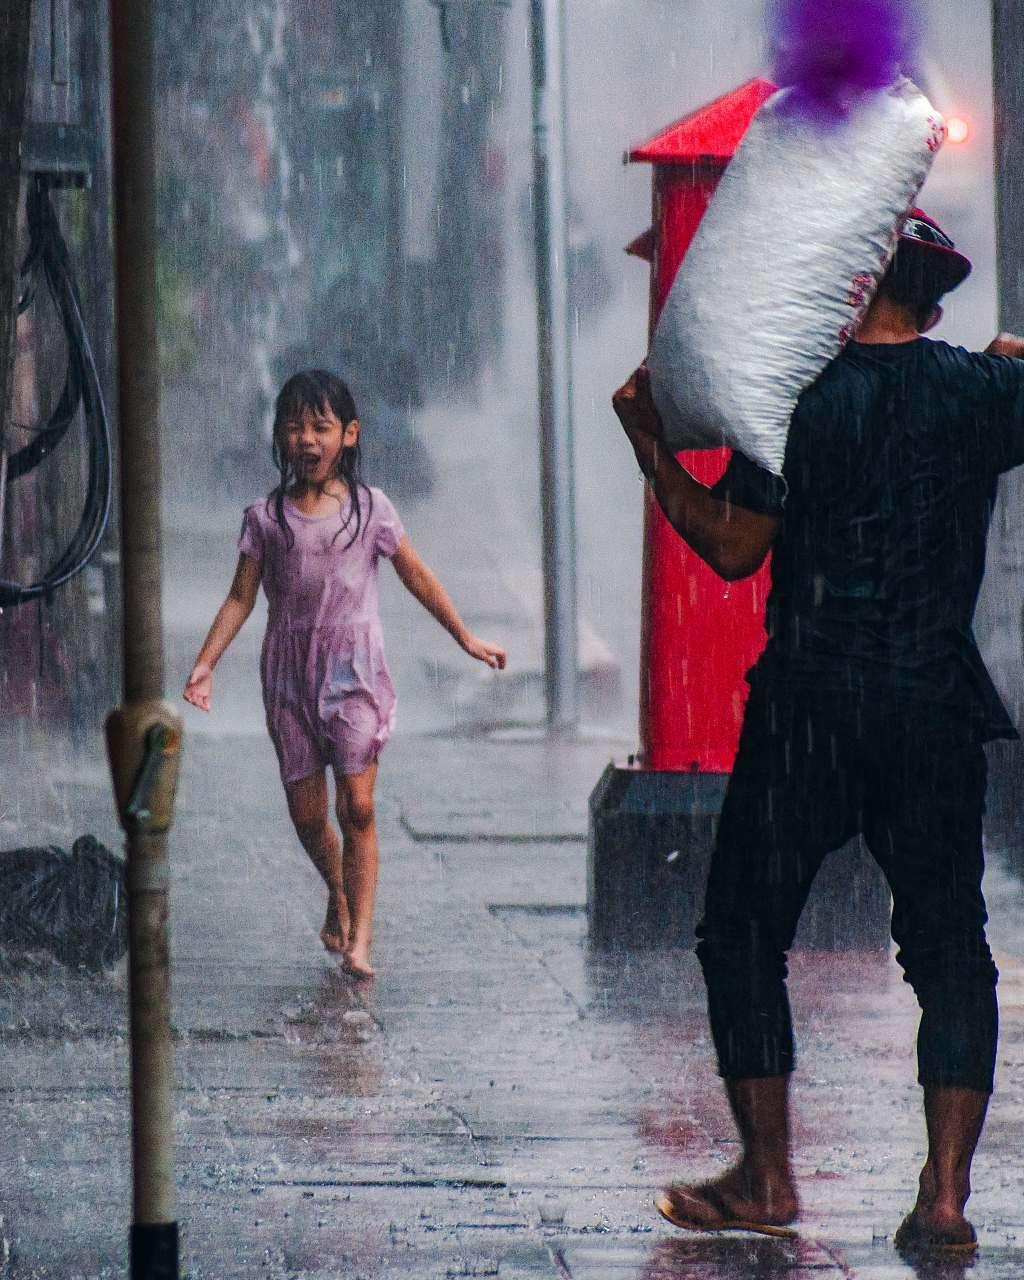 Little girl dancing in the rain